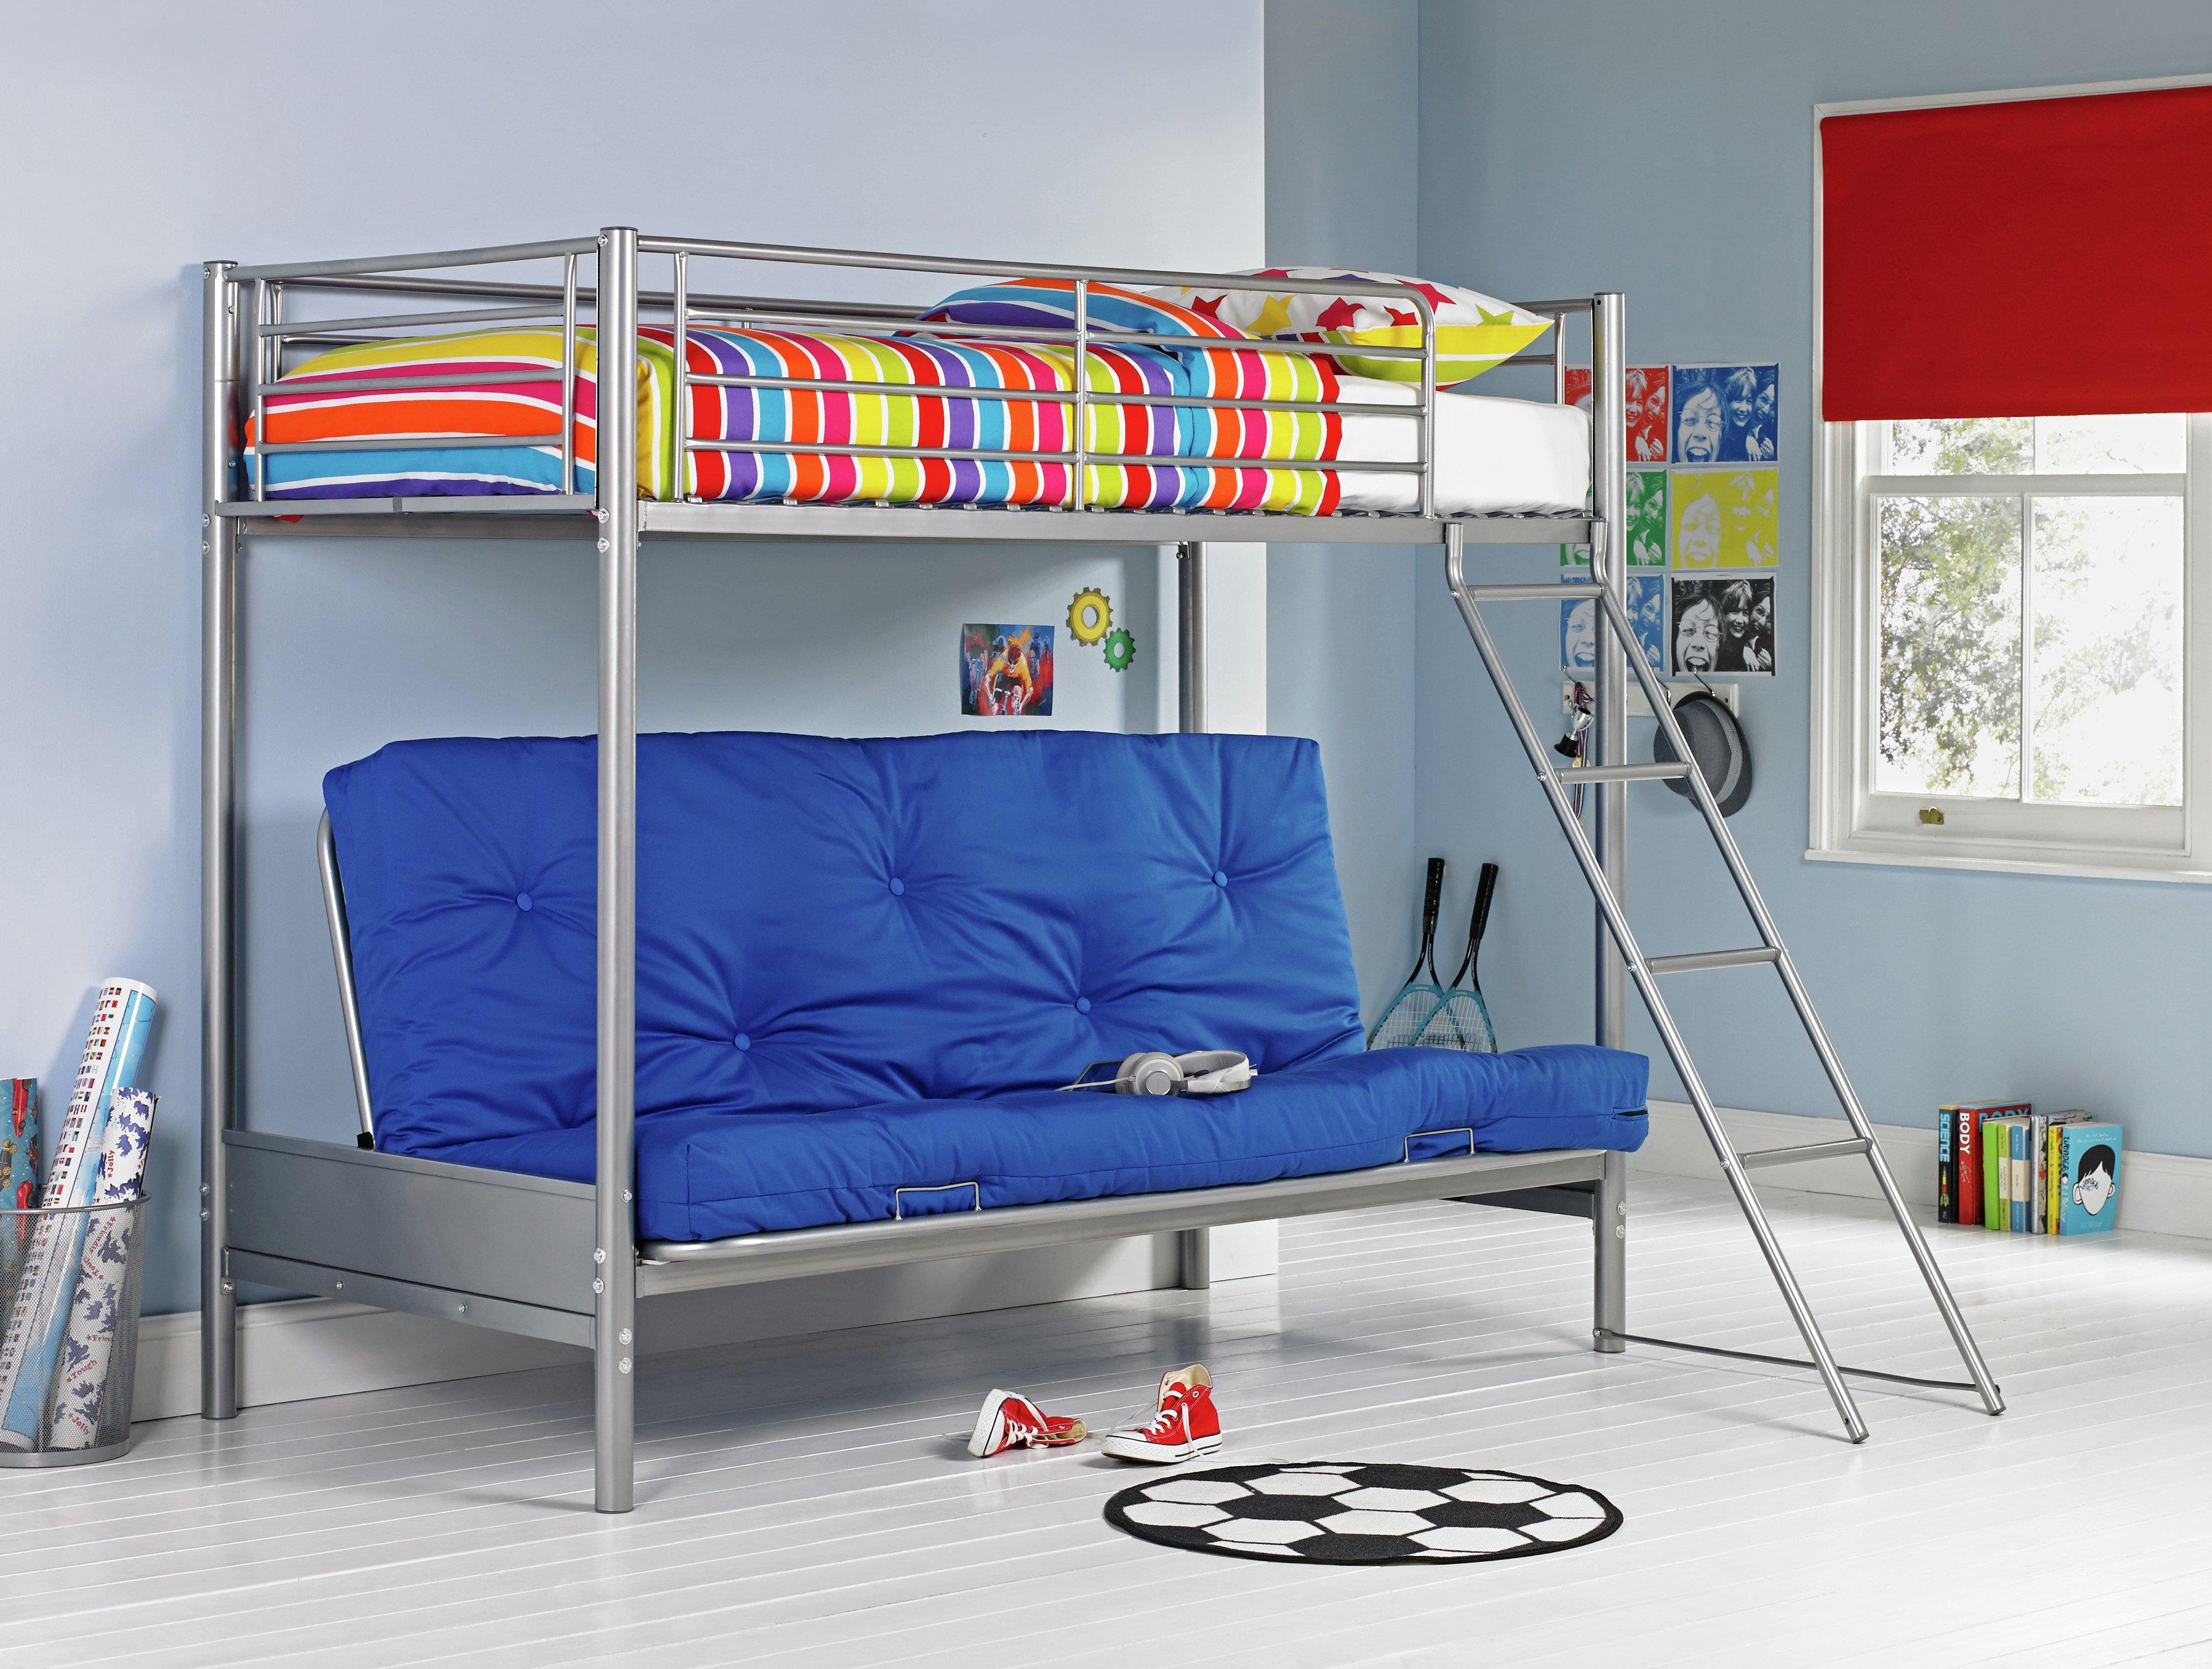 Argos Home Metal Bunk Bed, Blue Futon & Kids Mattress